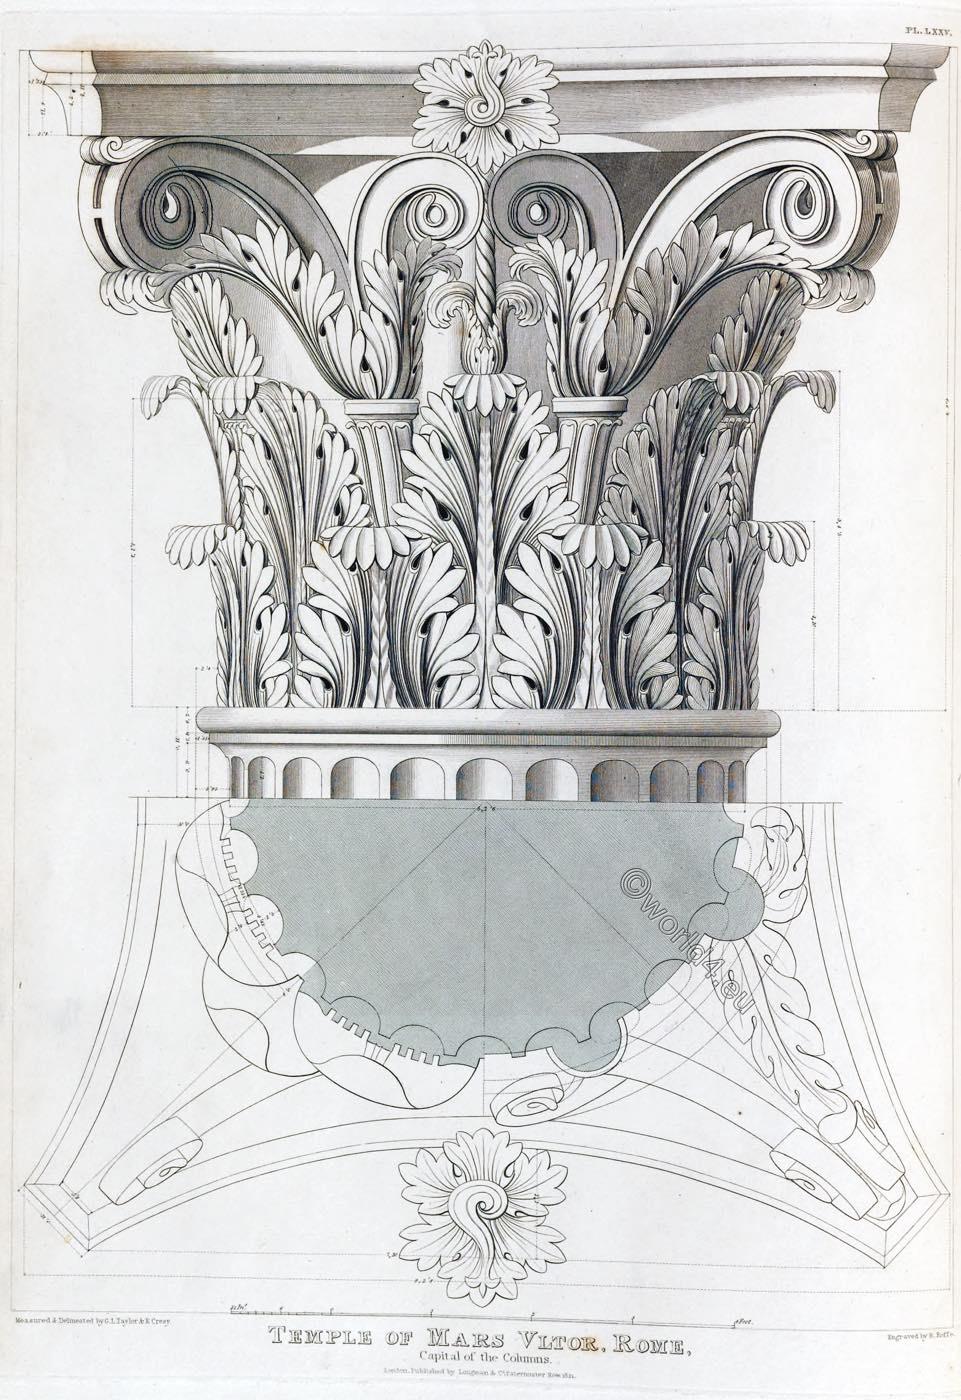 Temple, Mars, Ultor, Rome, Columns, Capital, Ornament, Decoration, Architecture, antiquities,